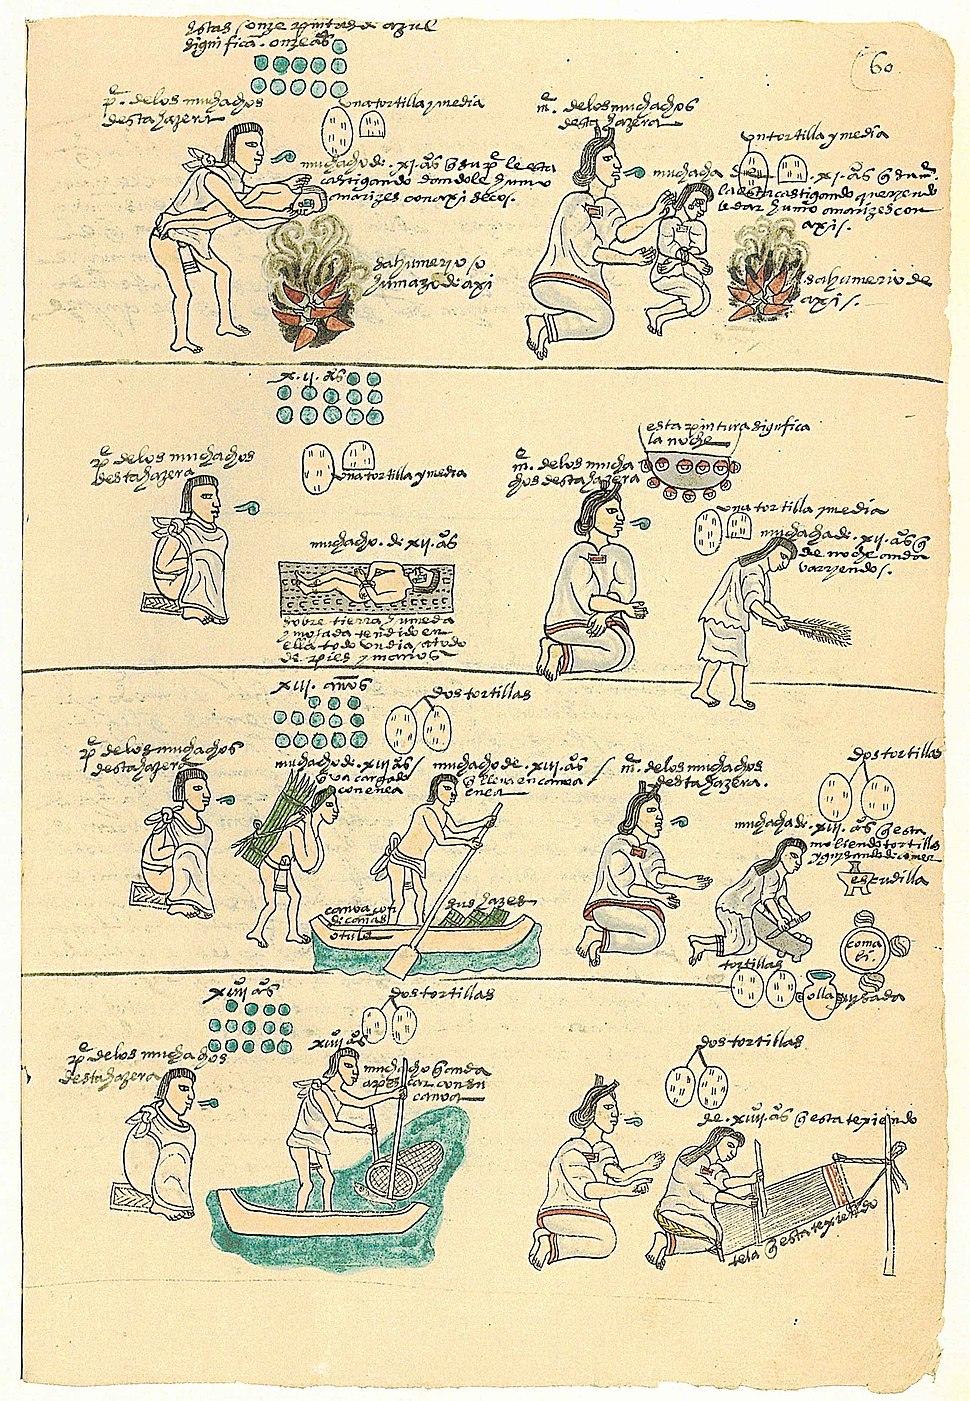 Codex Mendoza folio 60r